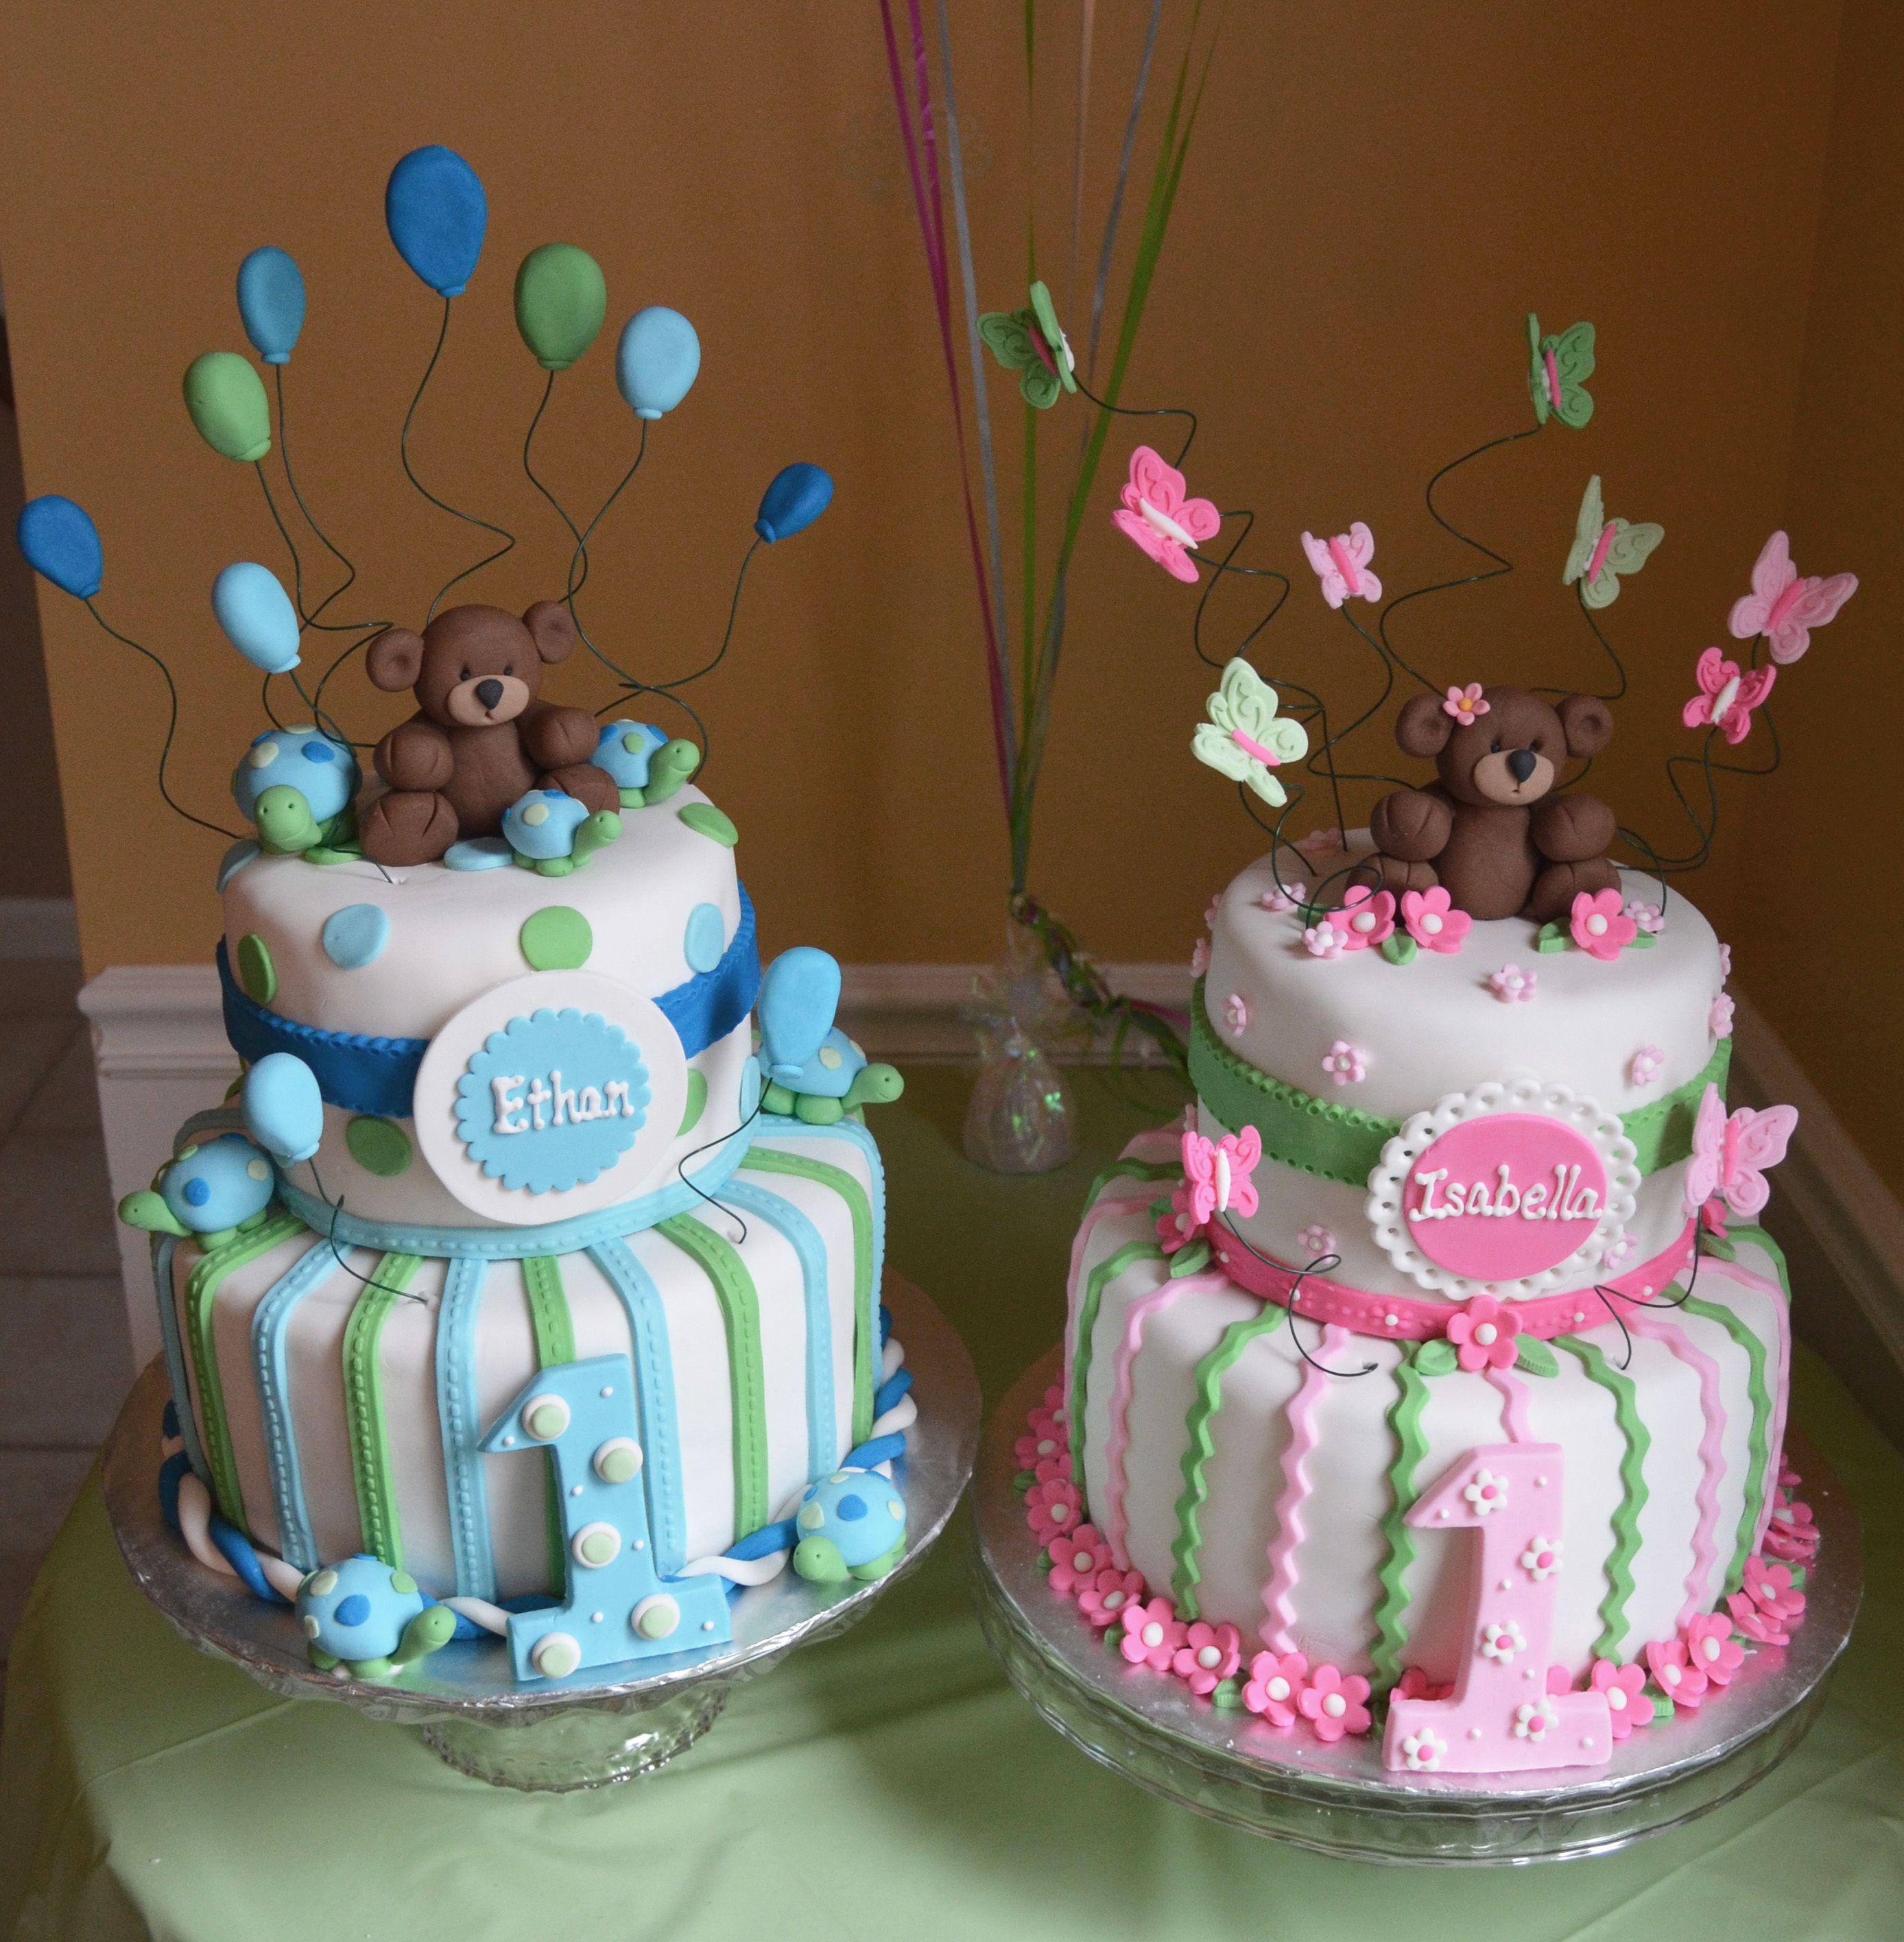 Twin 1 Year Birthday Cakes Boy And Girl Bears Turtles